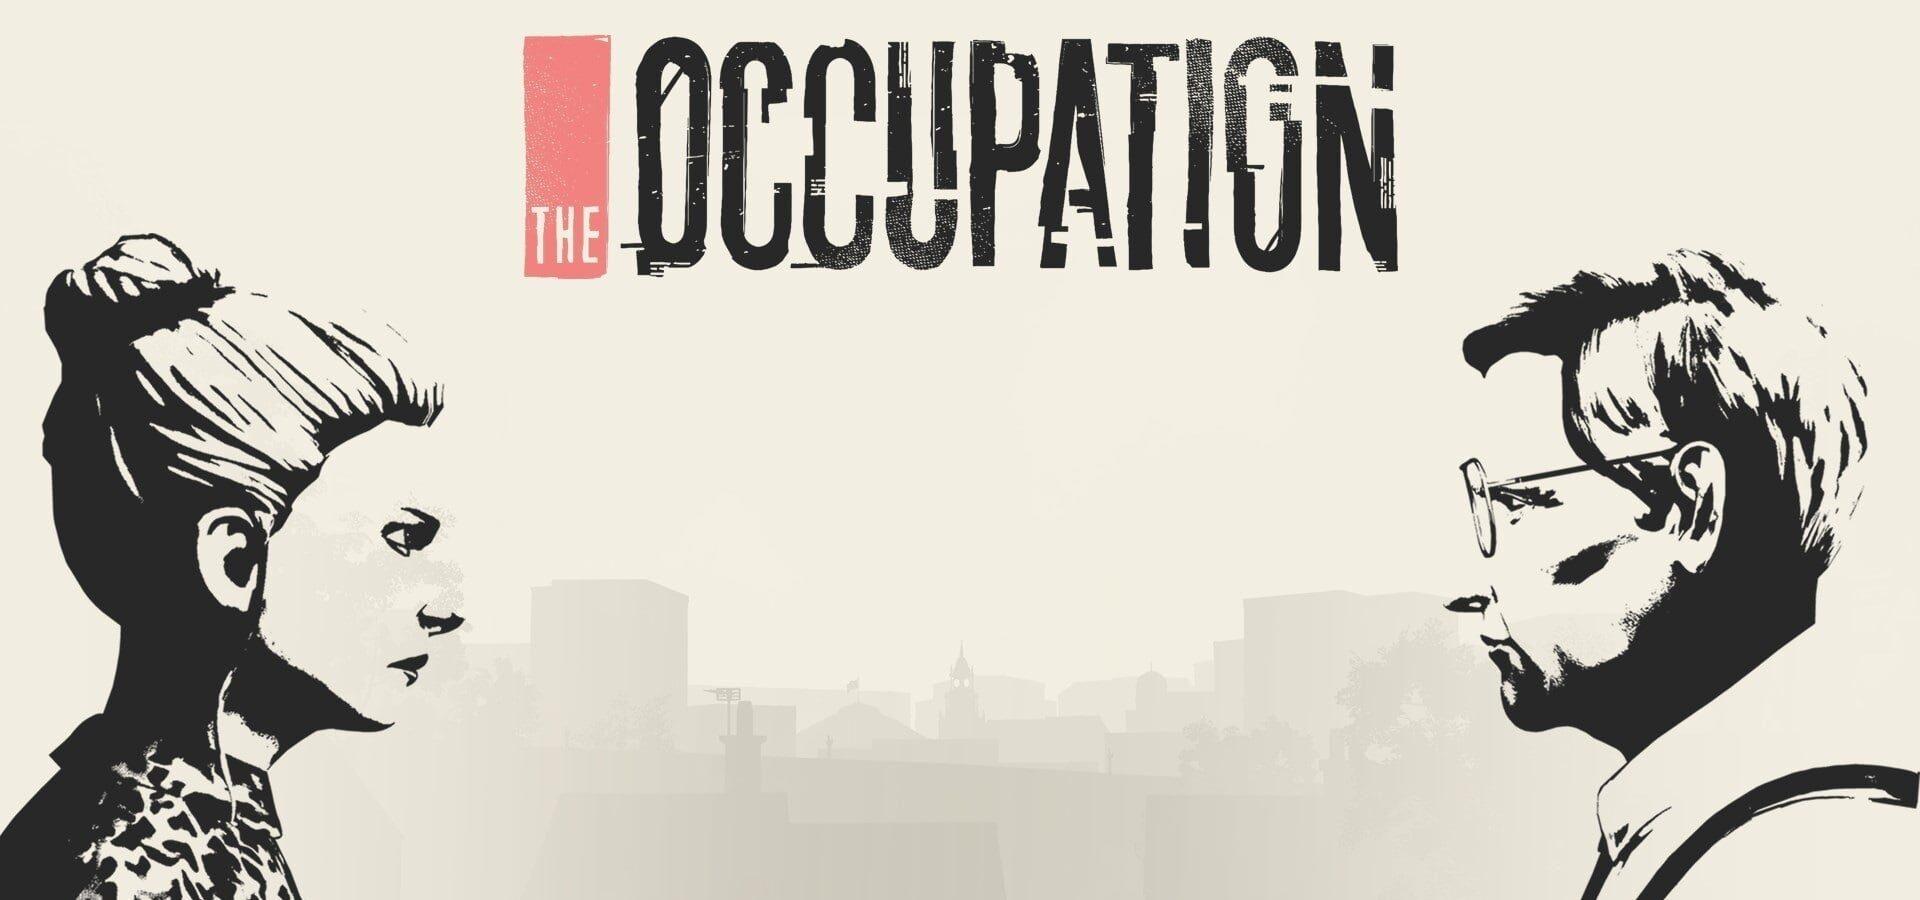 The Ocupation